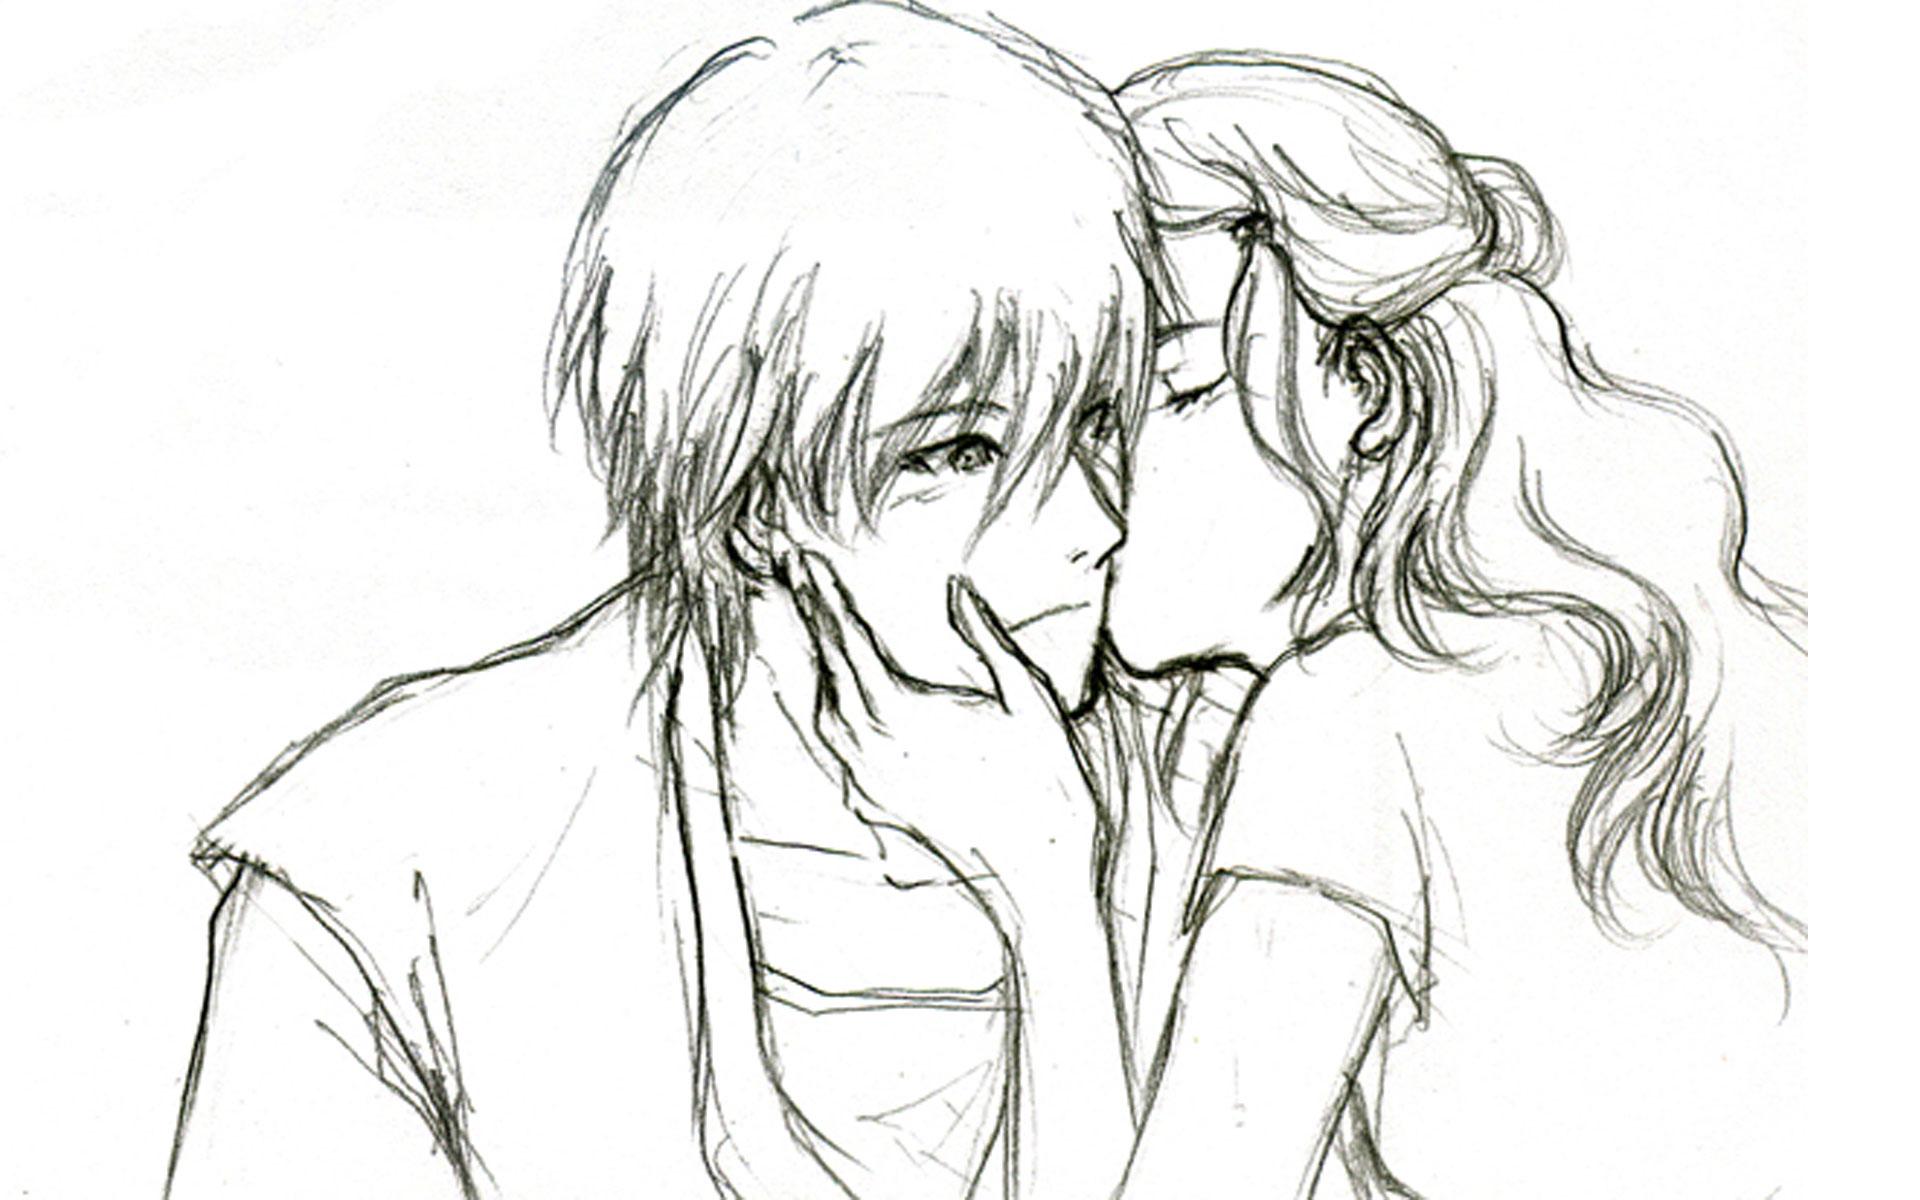 1920x1200 Pencil Sketch Of Cute Little Boy N Girl Pencil Sketch Of Cute